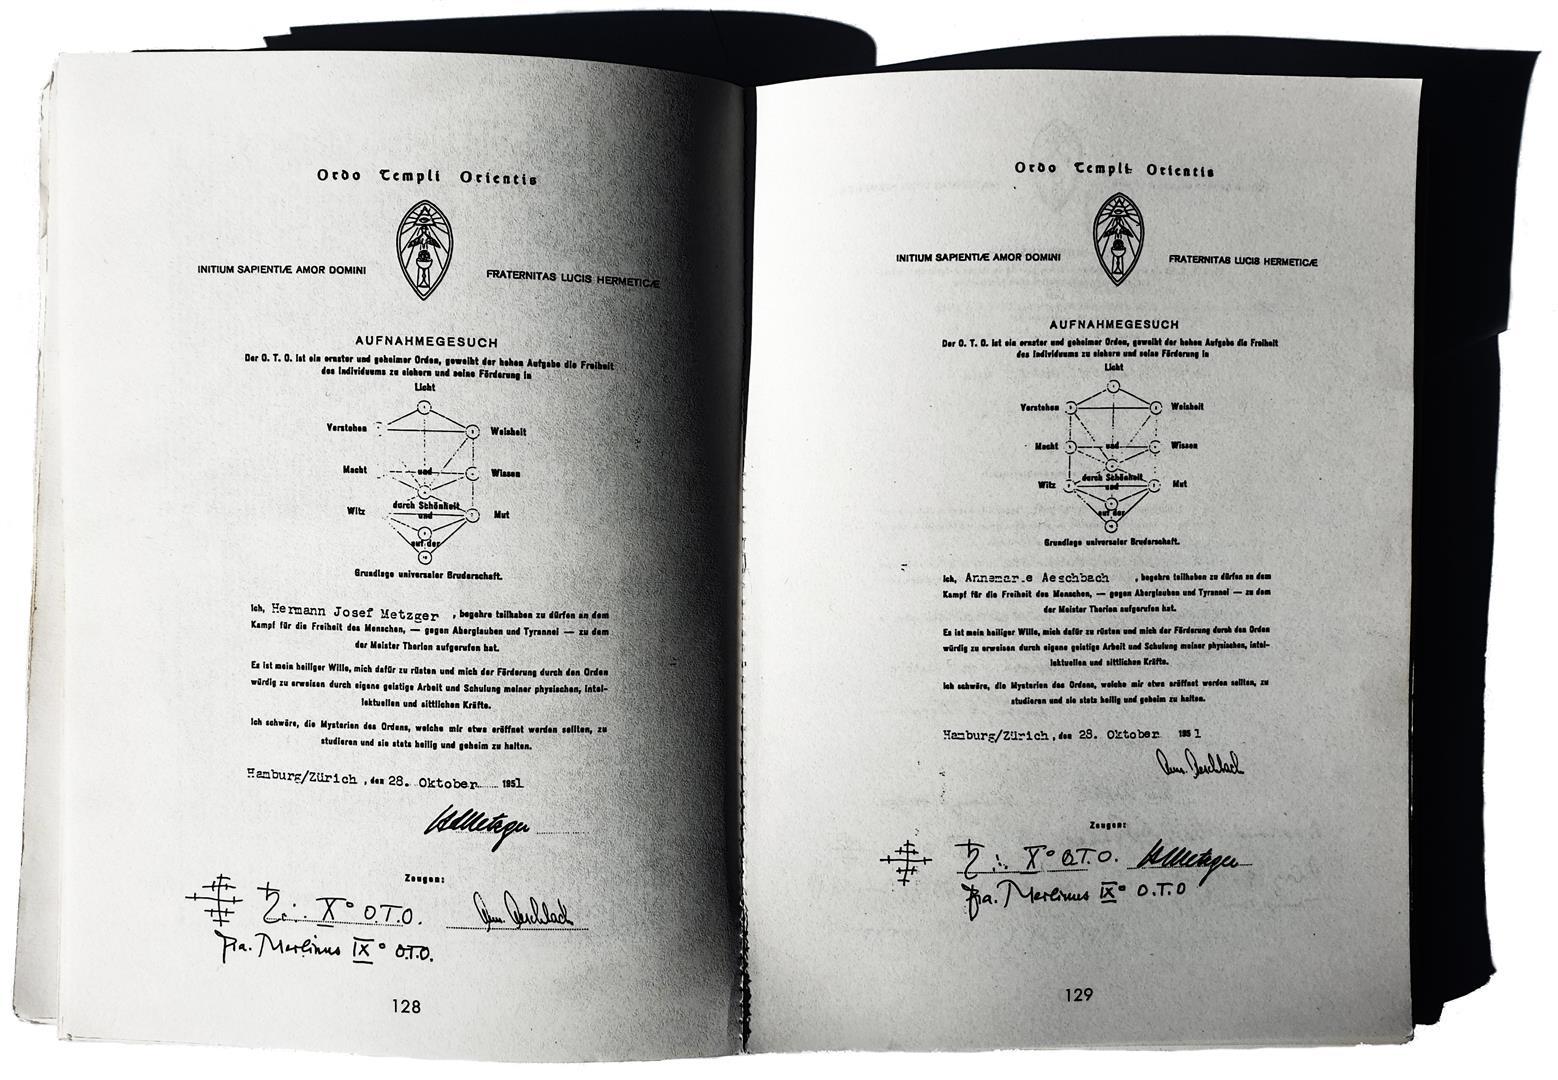 Hermann Joseph Metzger Annemarie Aeschbach O.T.O. Ordo Templi Orientis Karl Germer Friedrich Frederic Mellinger